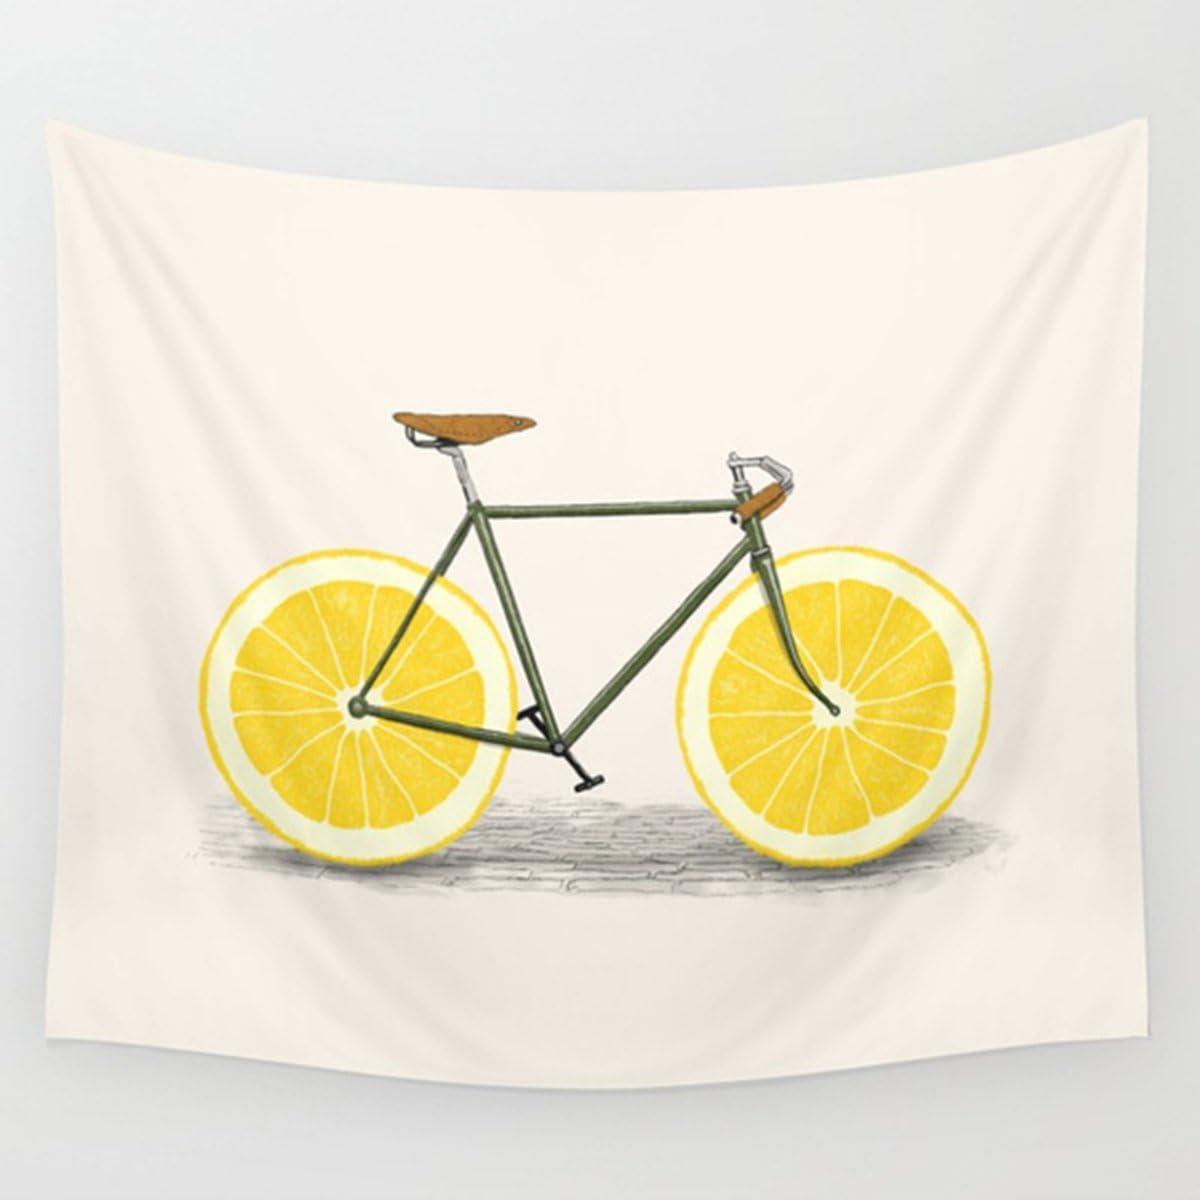 "Shukqueen Tapestry, Yellow Lemon Bike Wall Hanging Tapestry Dorm Decor (51"" H x 60"" W, Bike)"